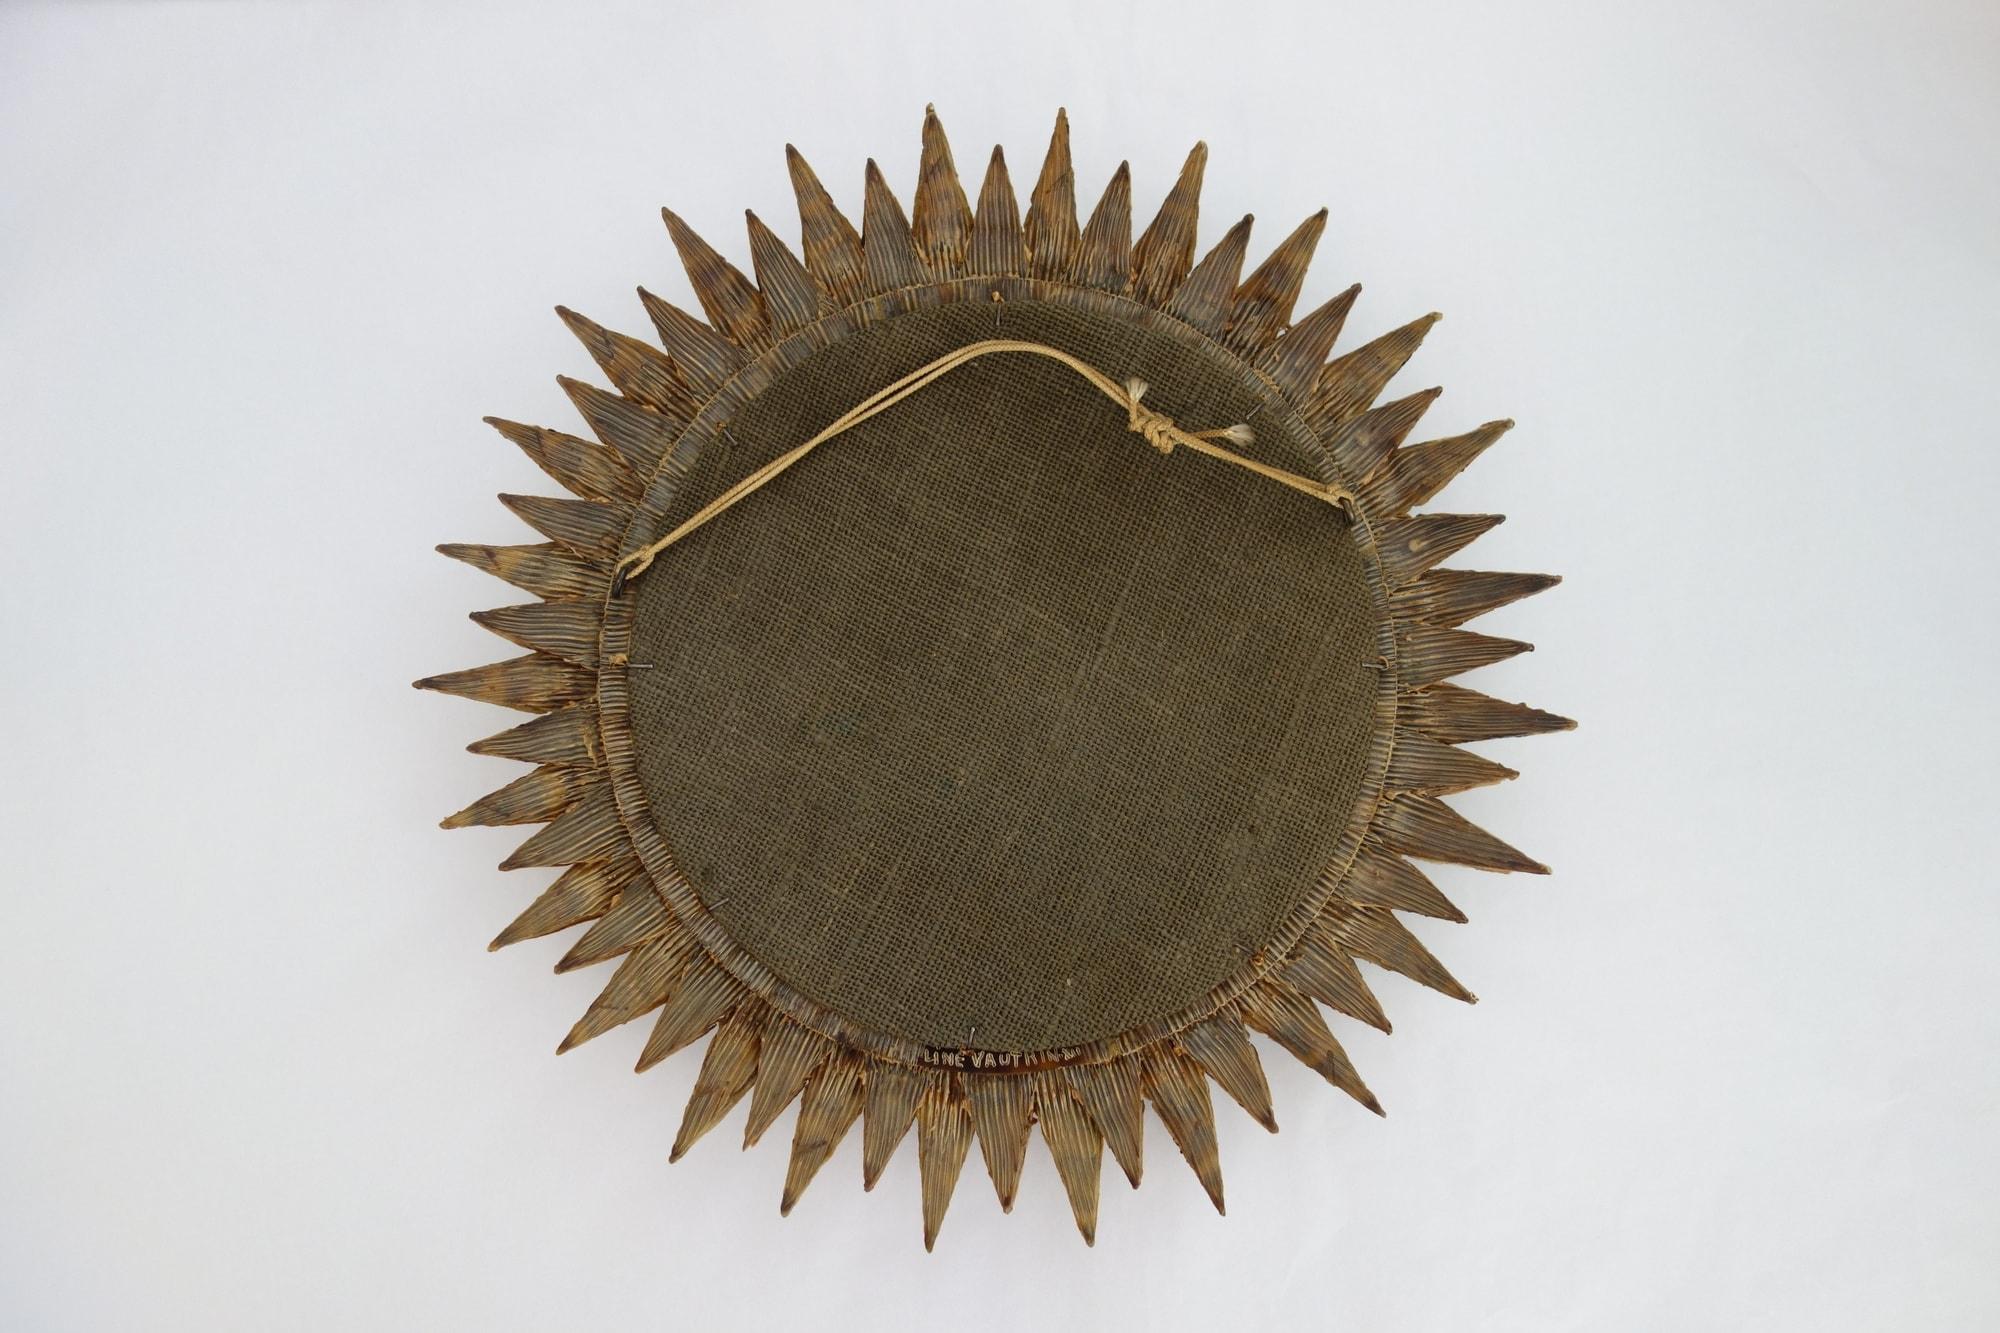 Line Vautrin, 'Soleil à pointes n°3' mirror, vue 02